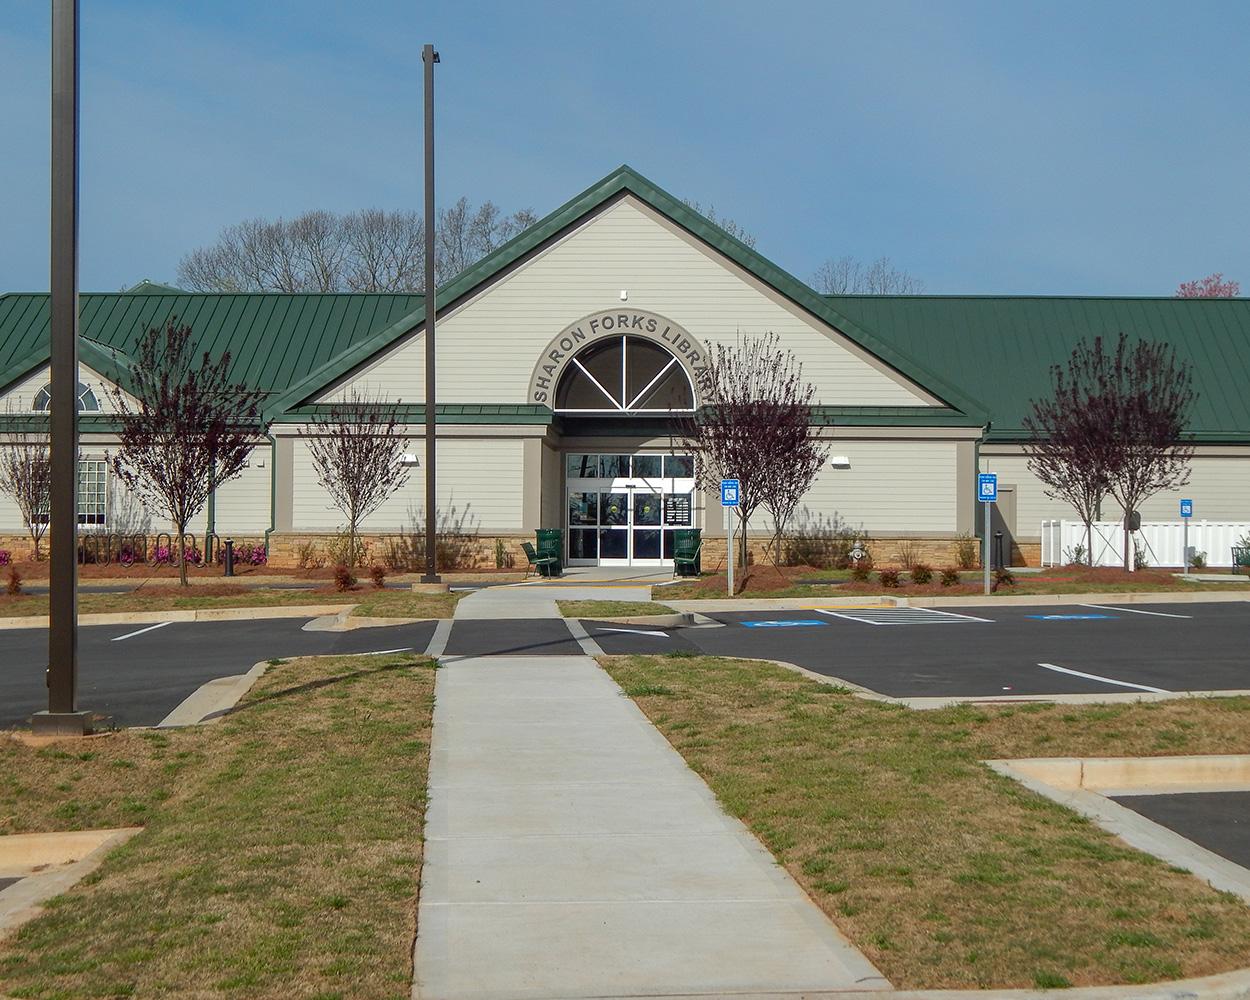 Sharon Forks Library Renovation   Cumming, GA